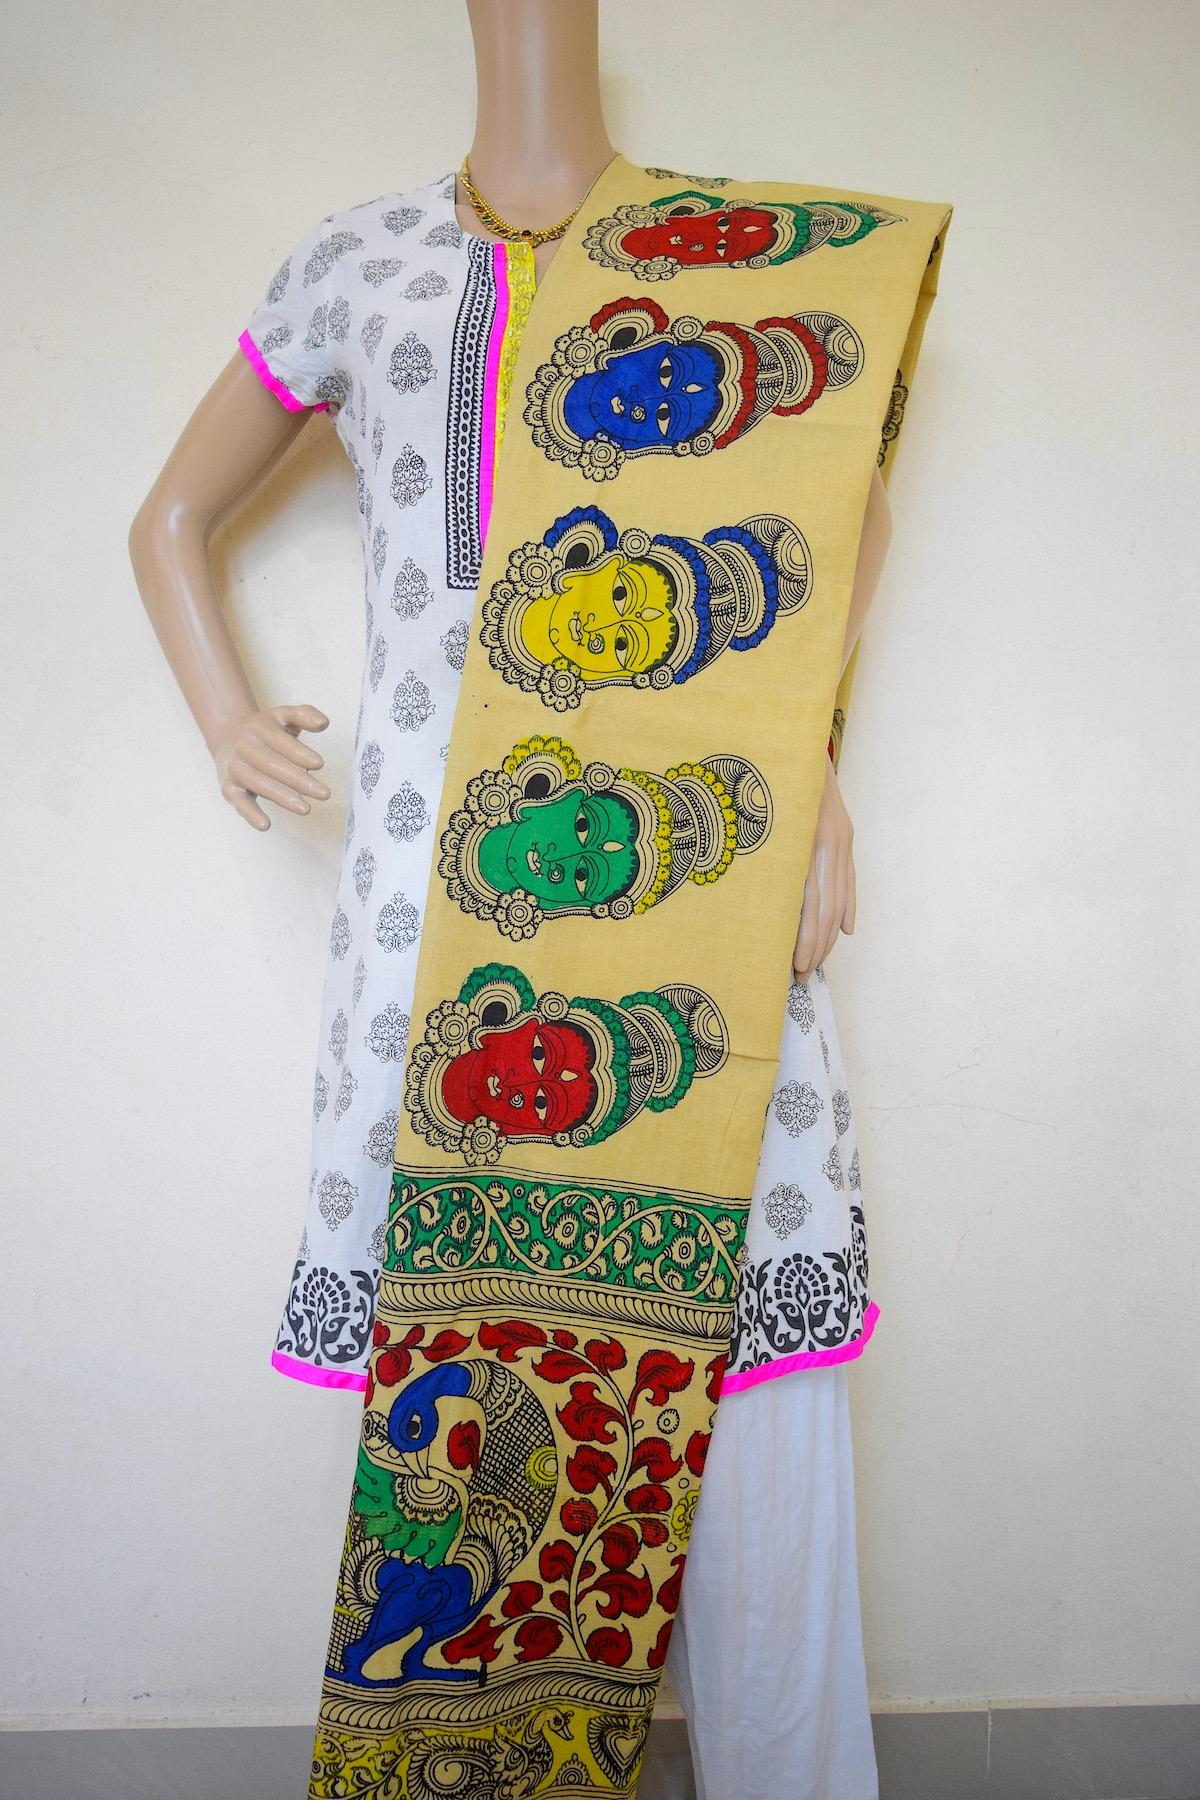 Kalamkari Telugu Talli Hand Painted Design Stole